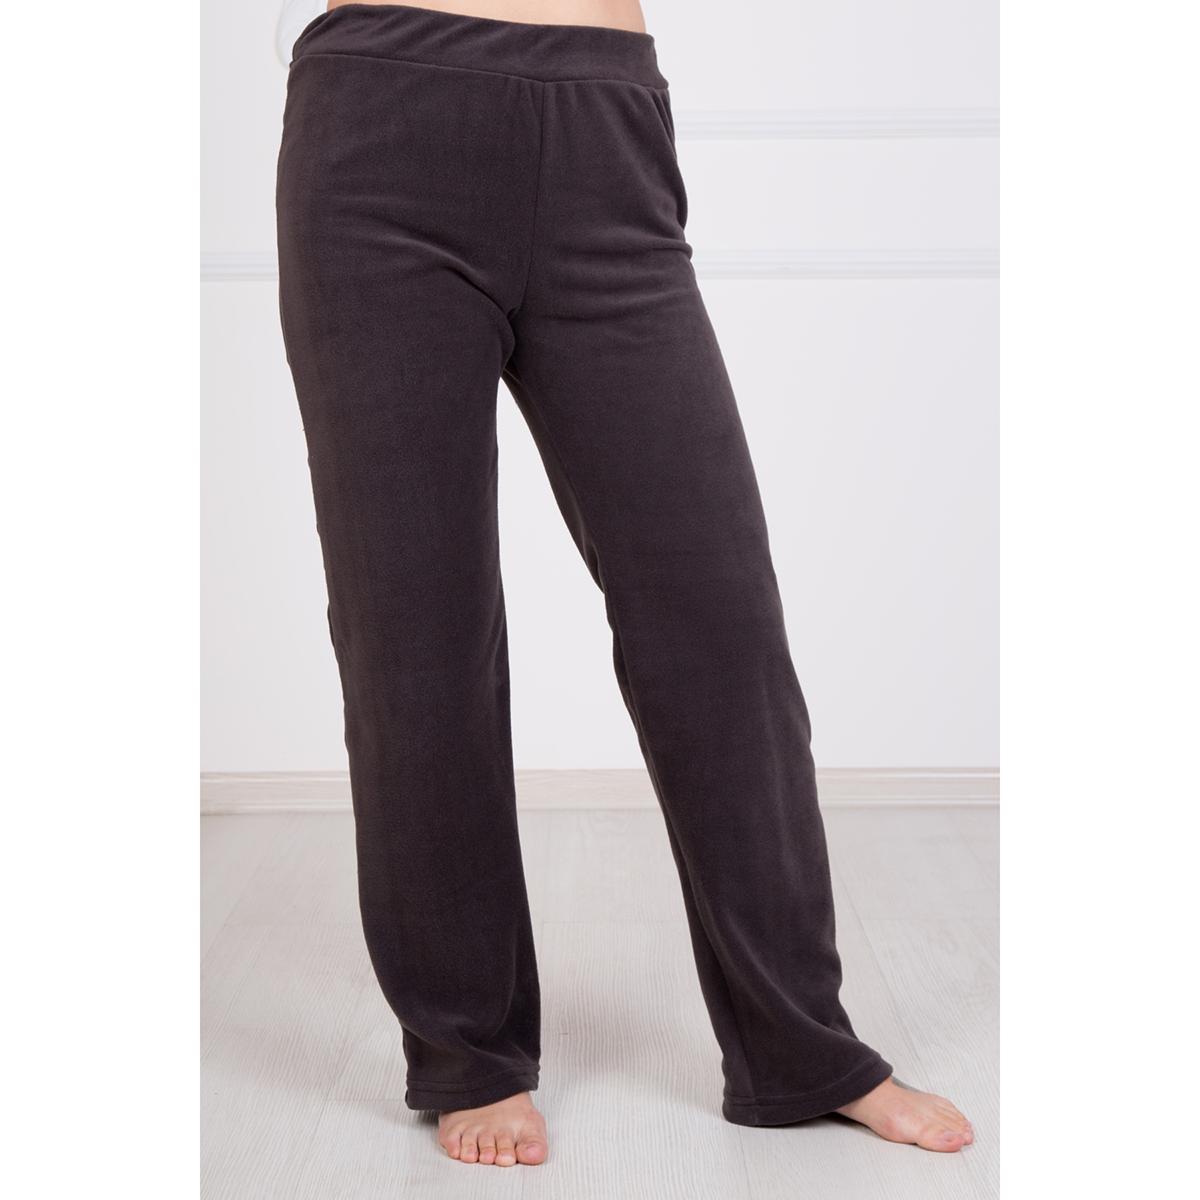 Женские брюки Флис, размер 44Брюки<br>Обхват талии:68 см<br>Обхват бедер:96 см<br>Рост:167 см<br><br>Тип: Жен. брюки<br>Размер: 44<br>Материал: Флис